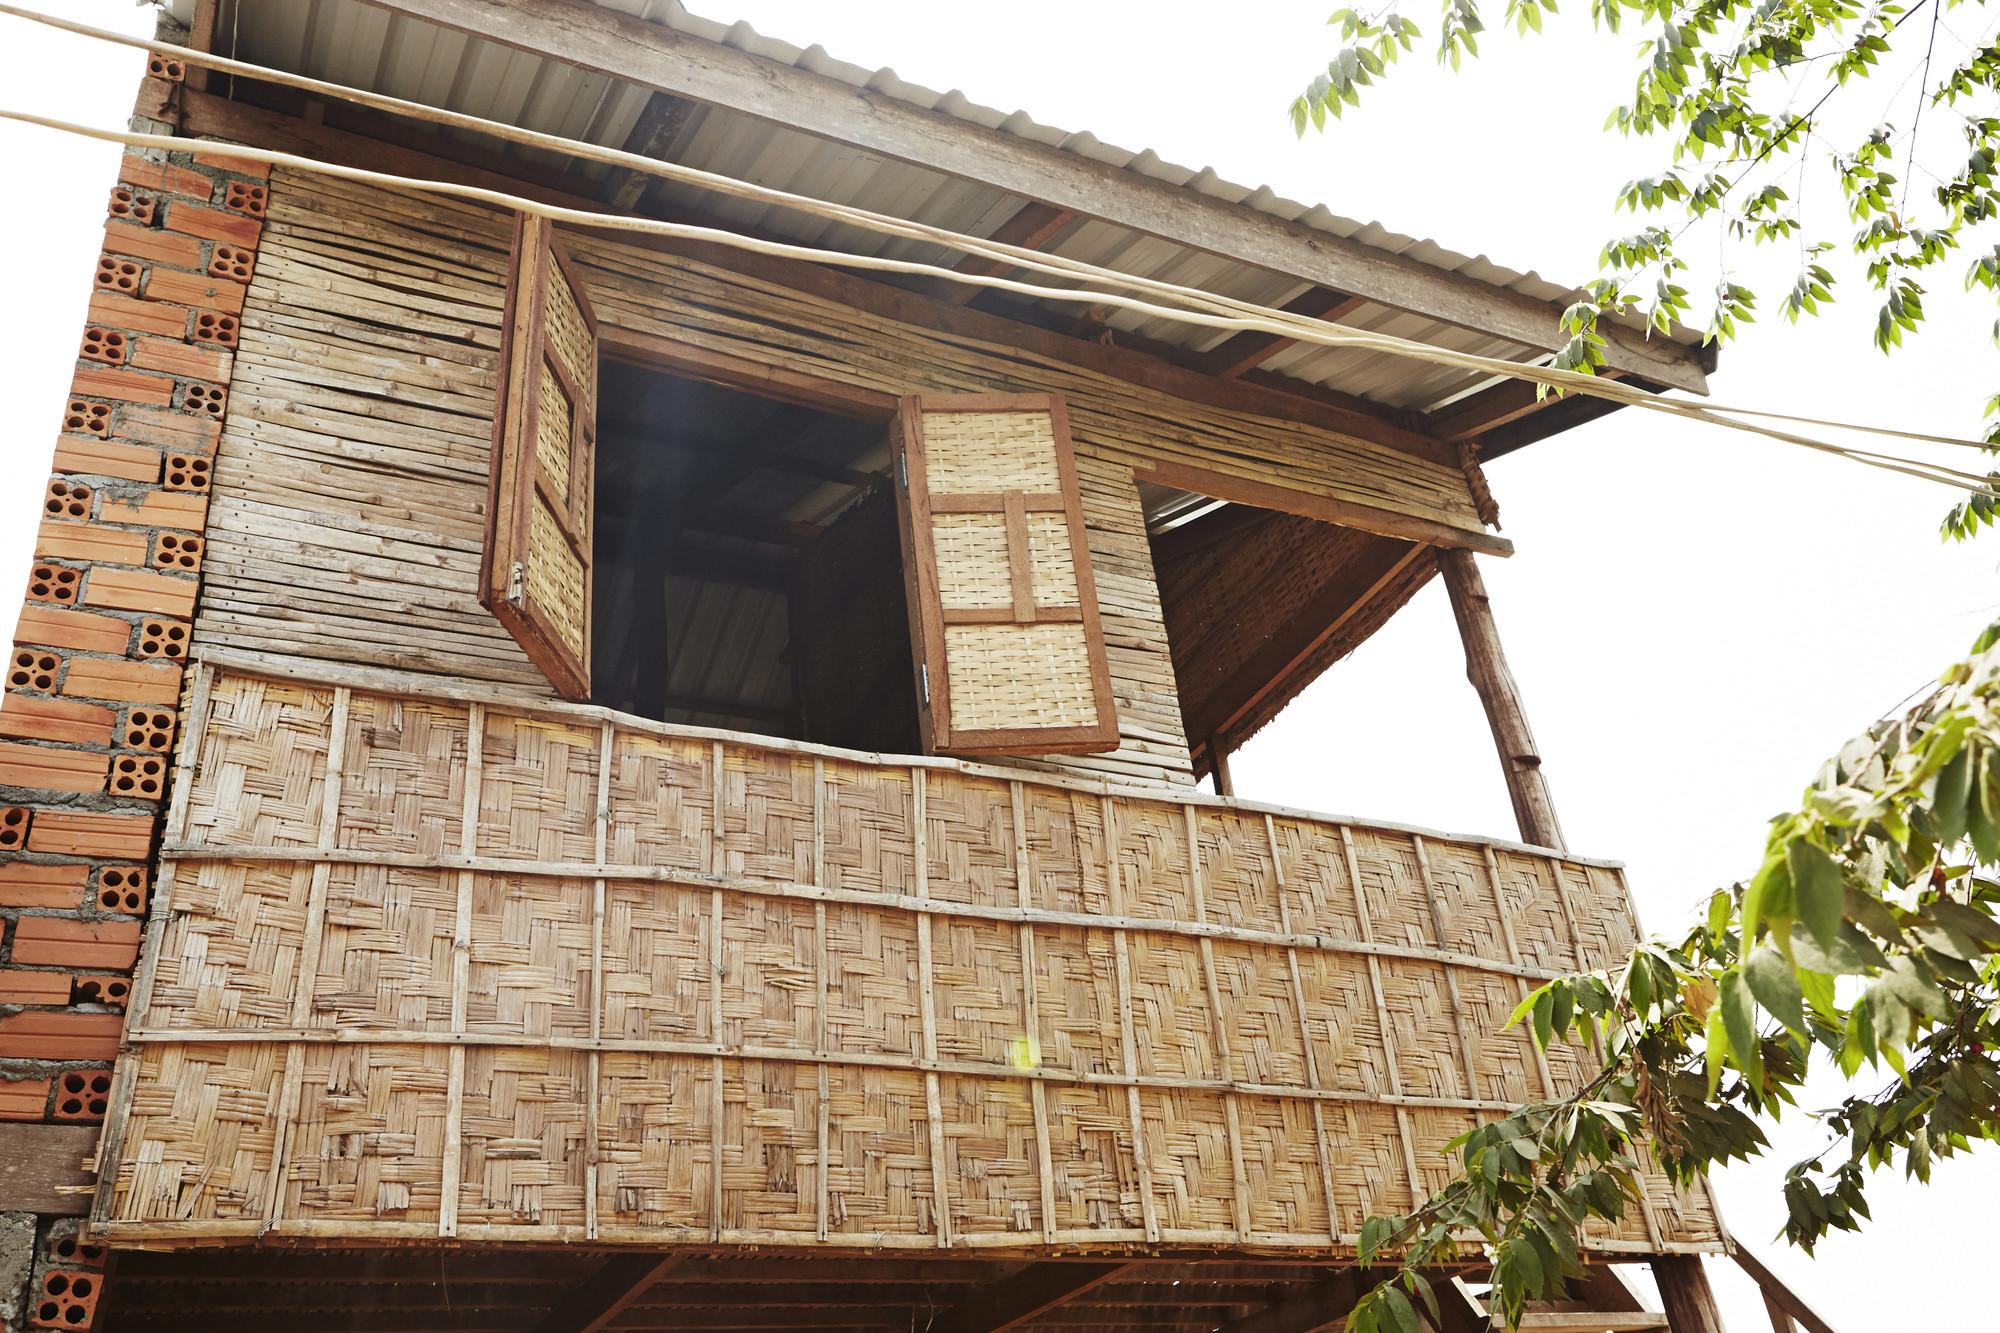 Courtyard House bamboo windows. Imágen © Building Trust International